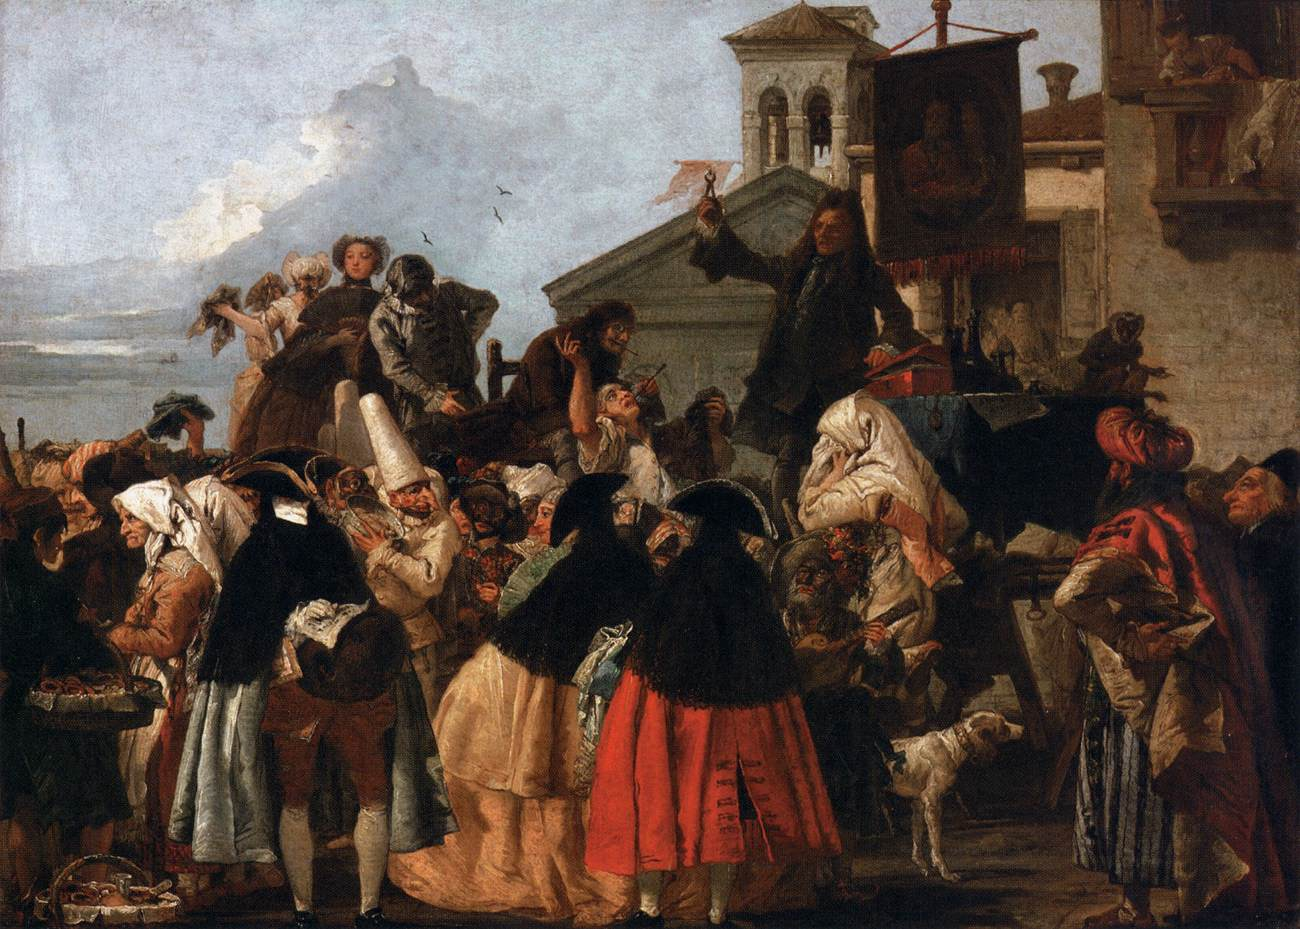 Giovanni_Domenico_Tiepolo_-_The_Charlatan_(The_Tooth-Puller)_-_WGA22380.jpg